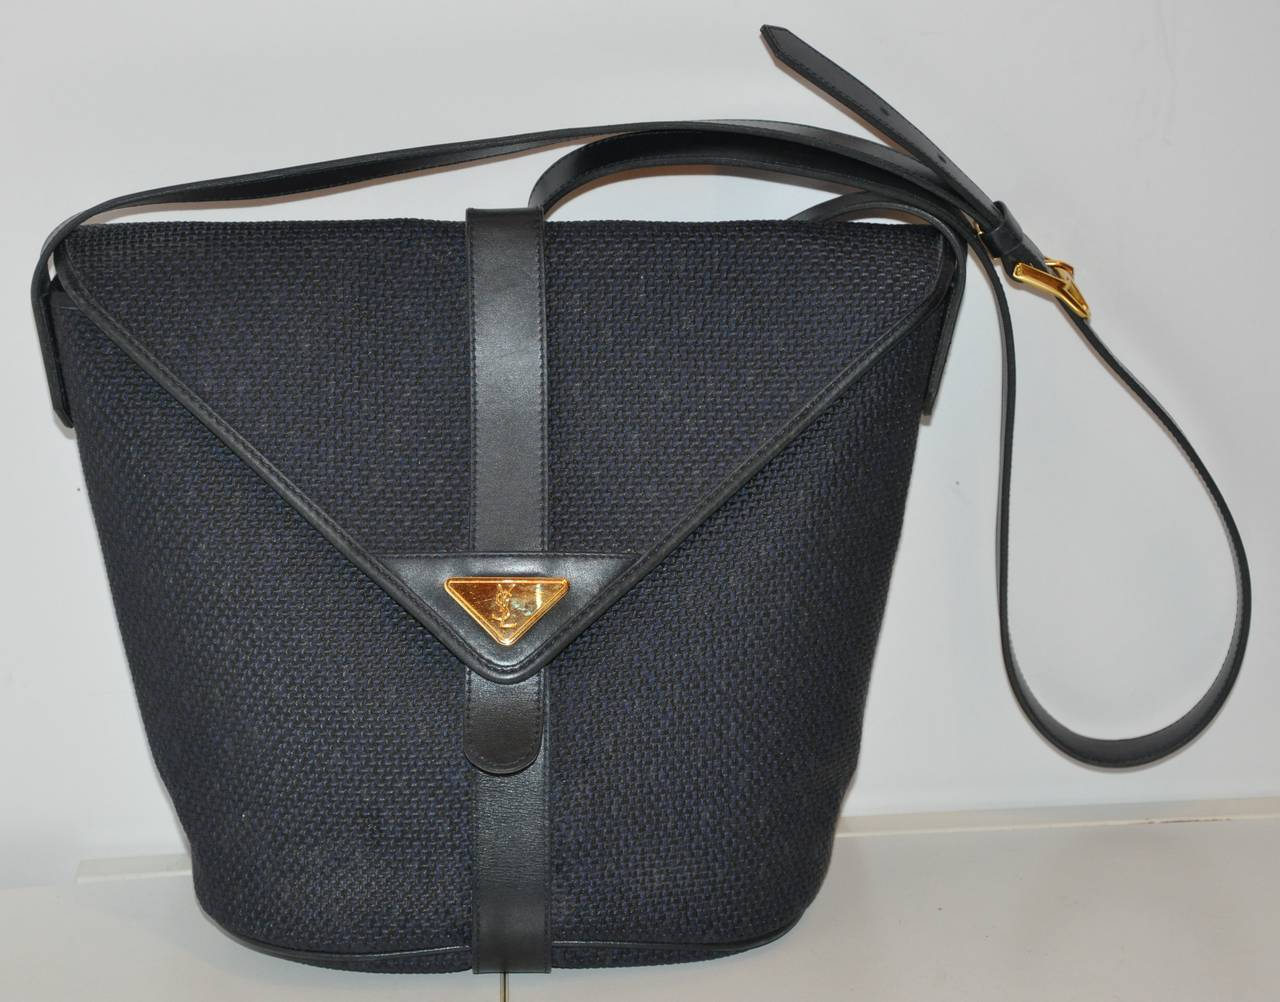 Yves Saint Laurent Woven Weave Navy Flap Over Shoulder Bag